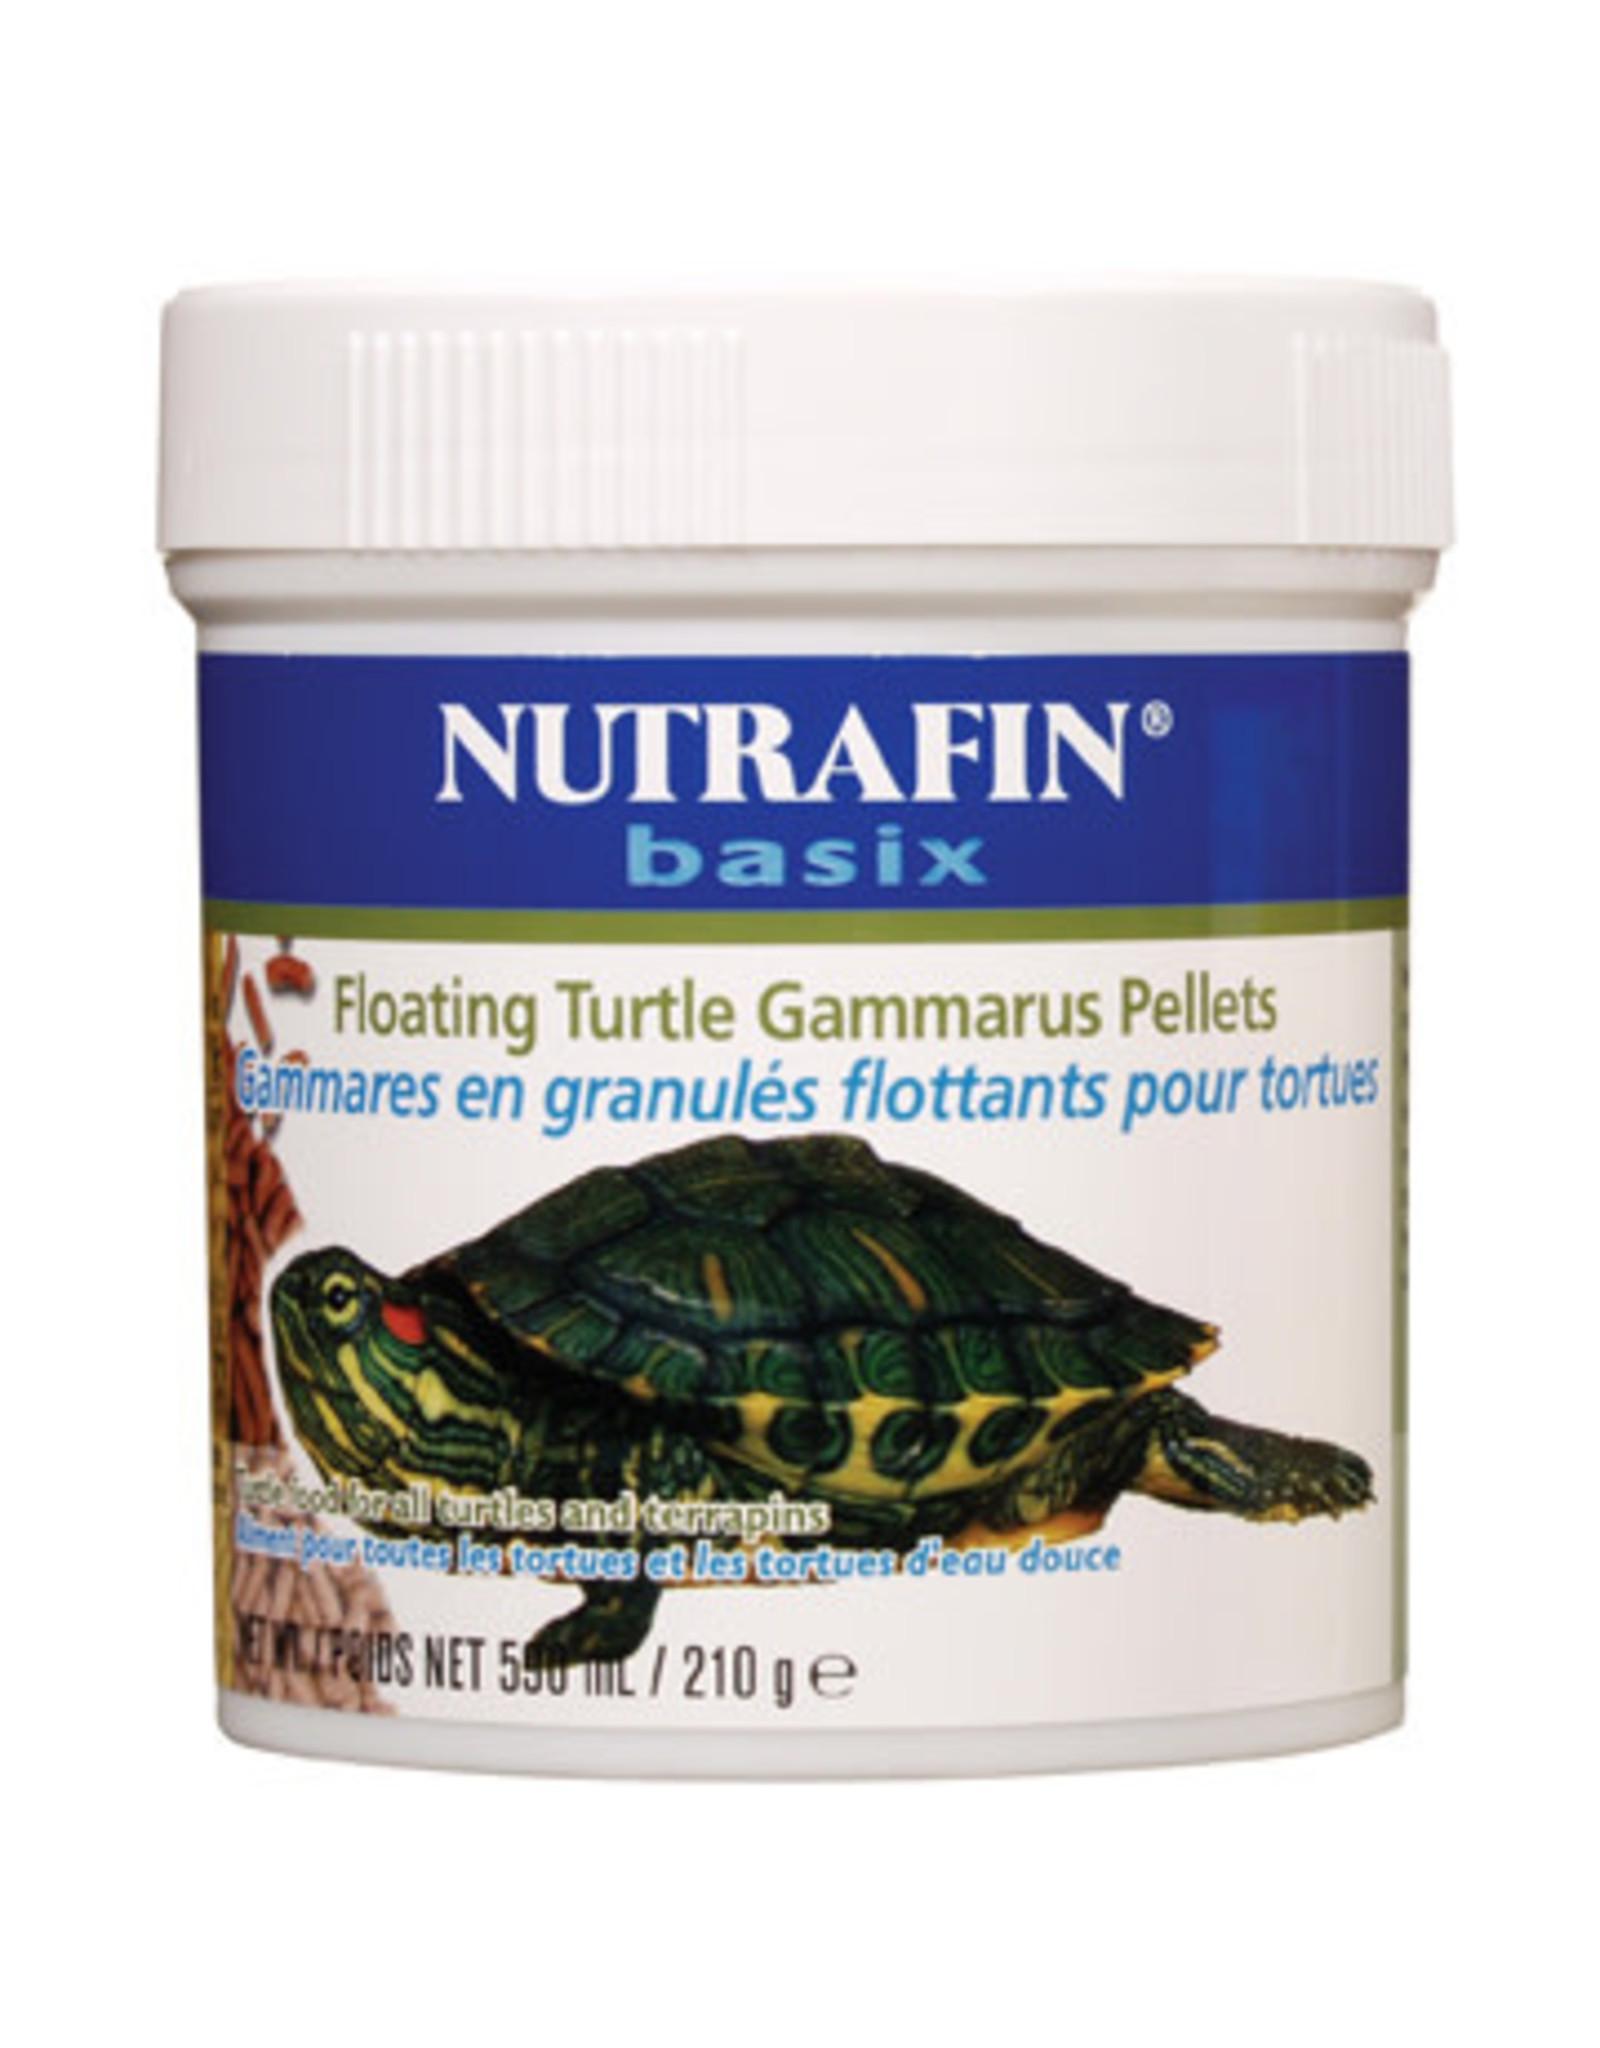 Nutrafin Nutrafin Basix Turtle Gammarus Pellet, 210 g (7.4 oz)